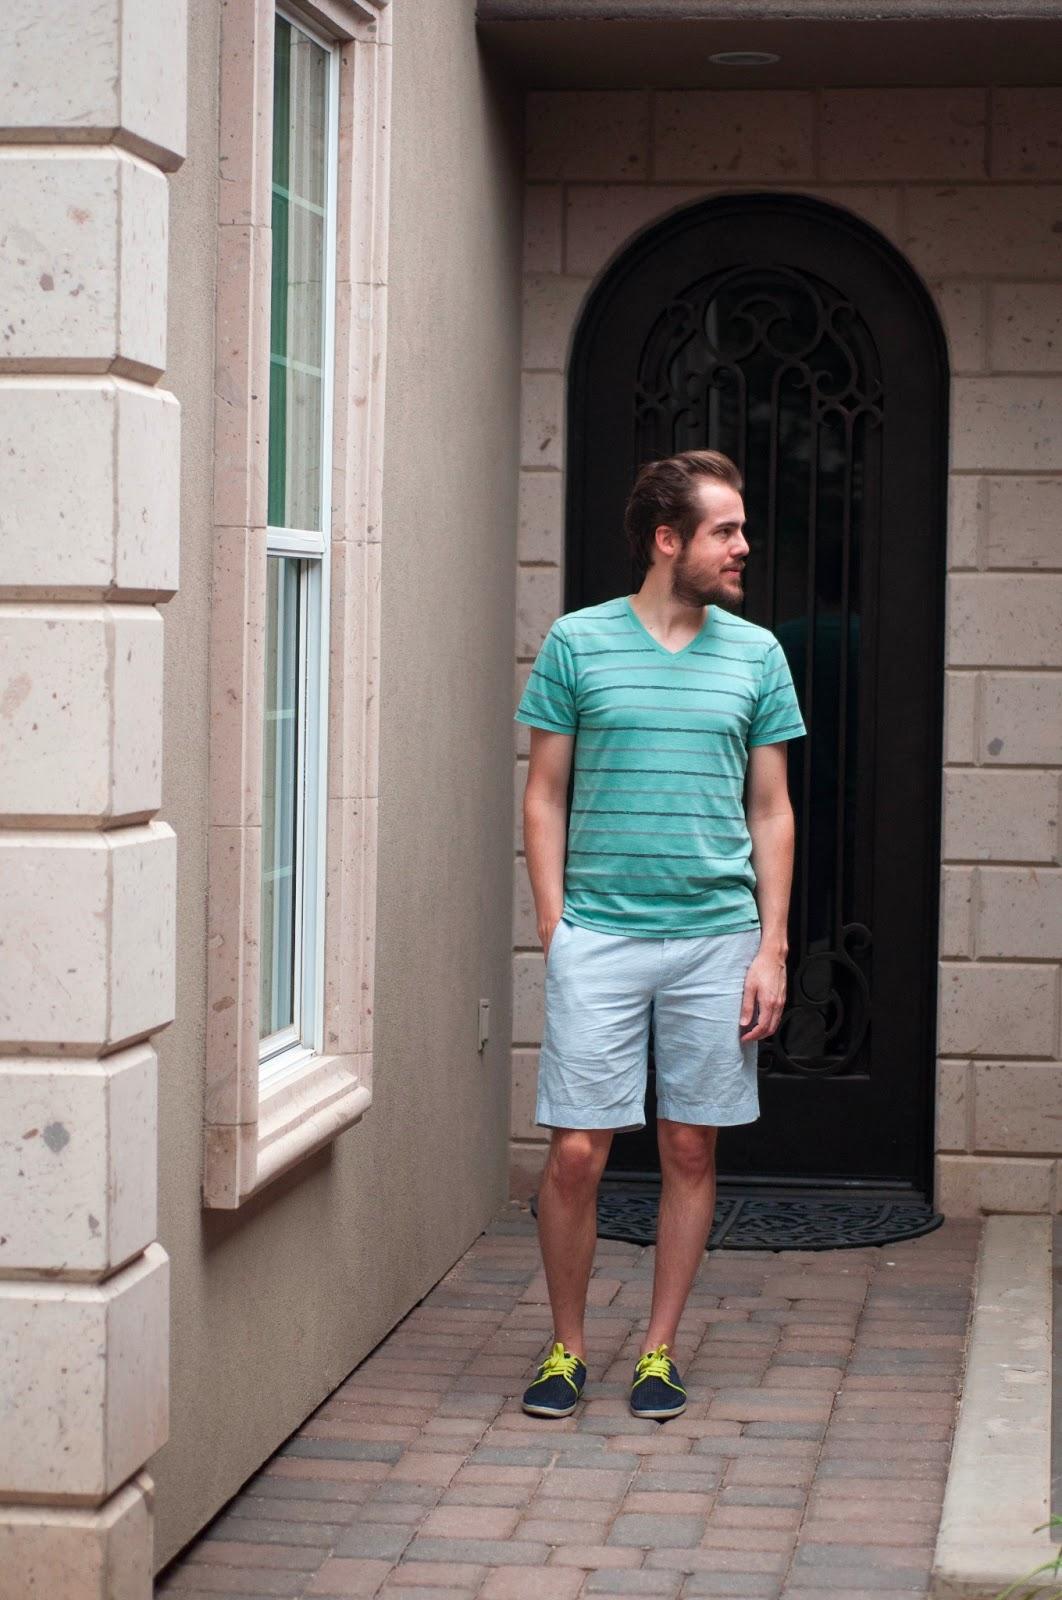 "mens style blog, mens fashion blog, neon laces, navy tennis shoes, zara shoes, jcrew 9"" stanton shorts, stripe shirt, mint"